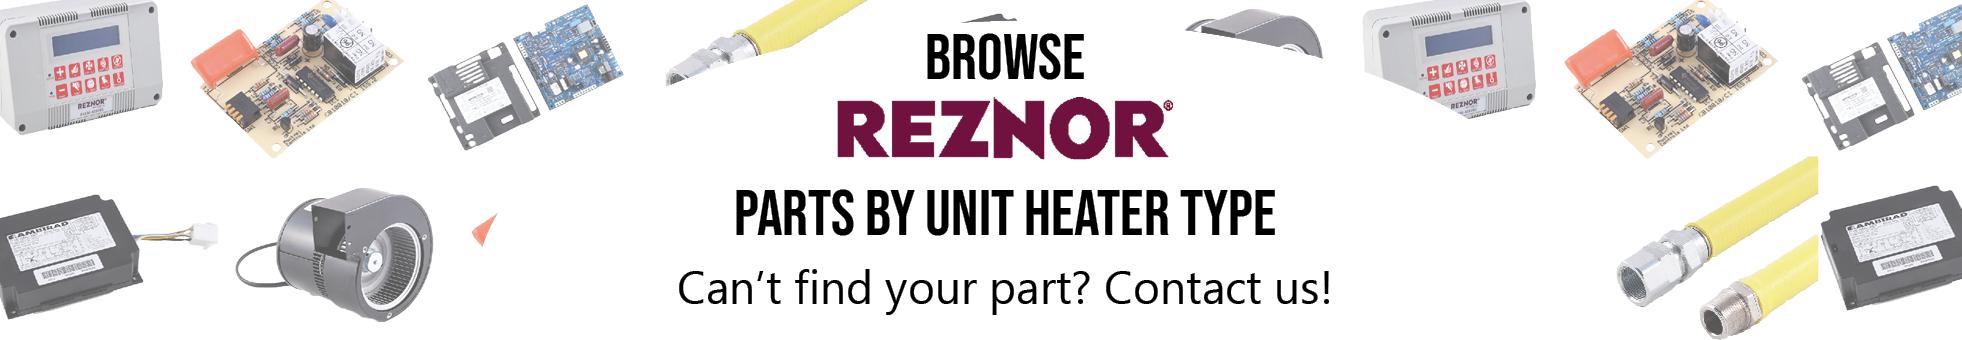 Rezor-unit-heater-spares